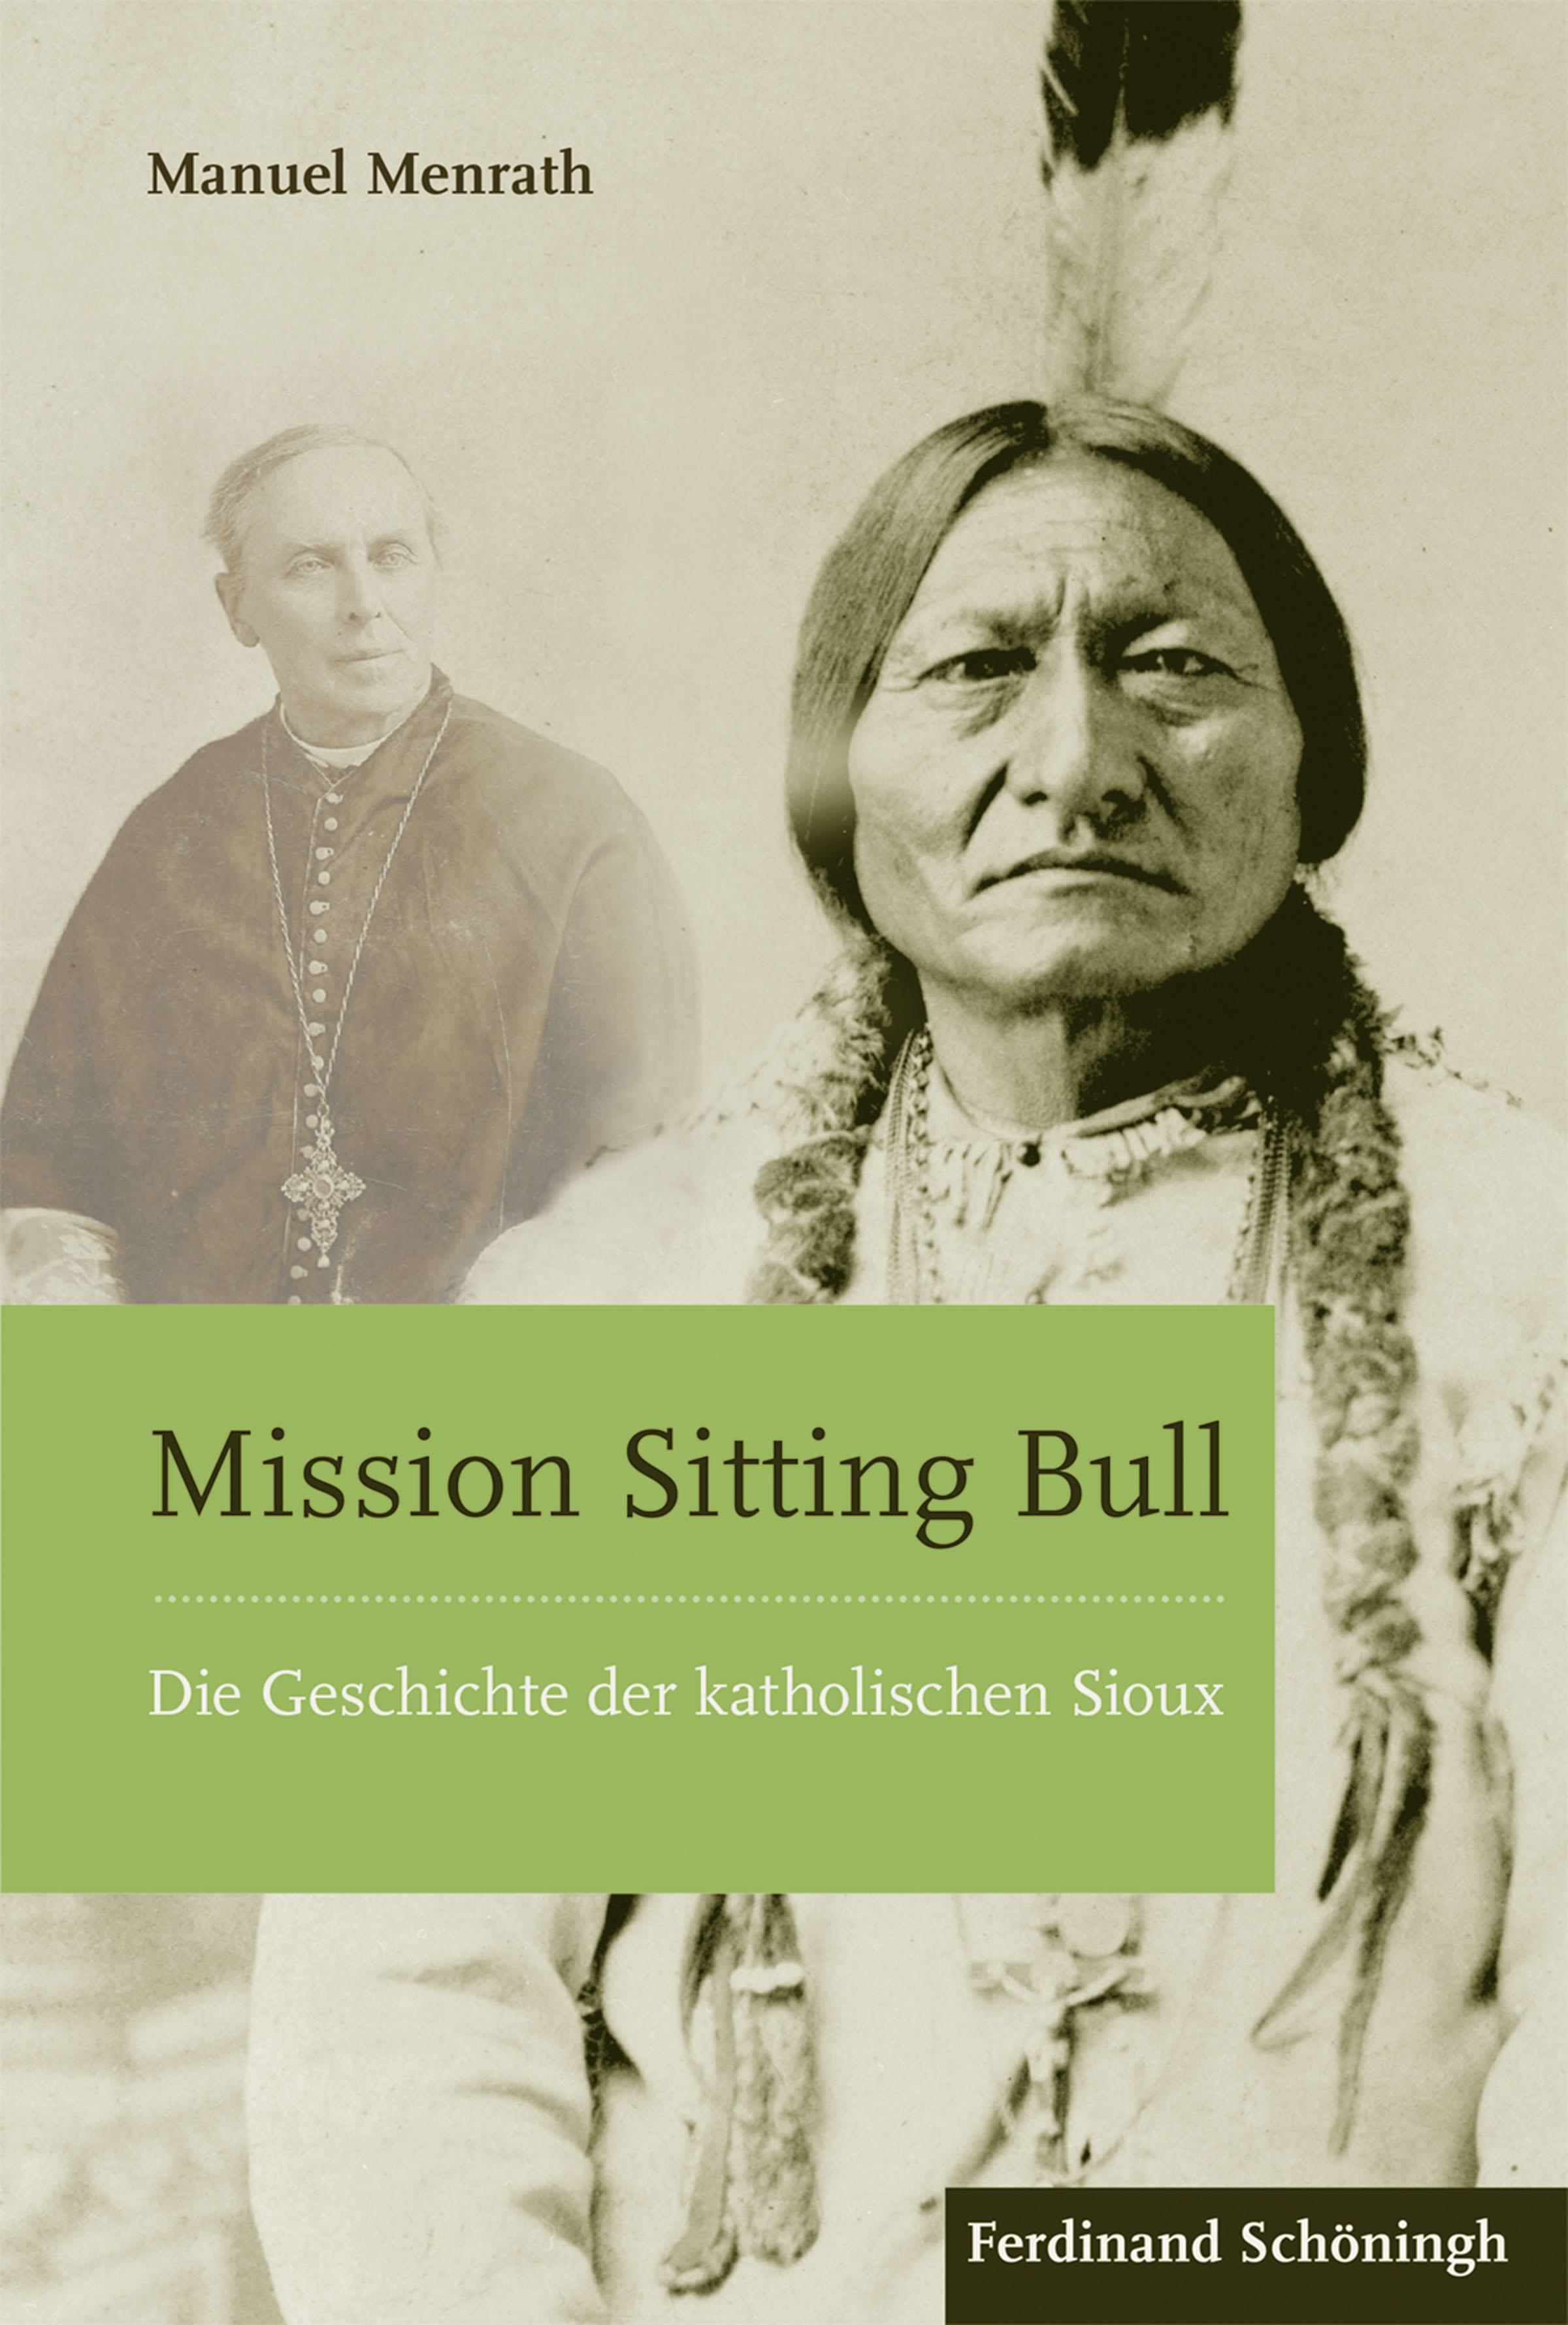 Mission Sitting Bull | Manuel Menrath |  9783506783790